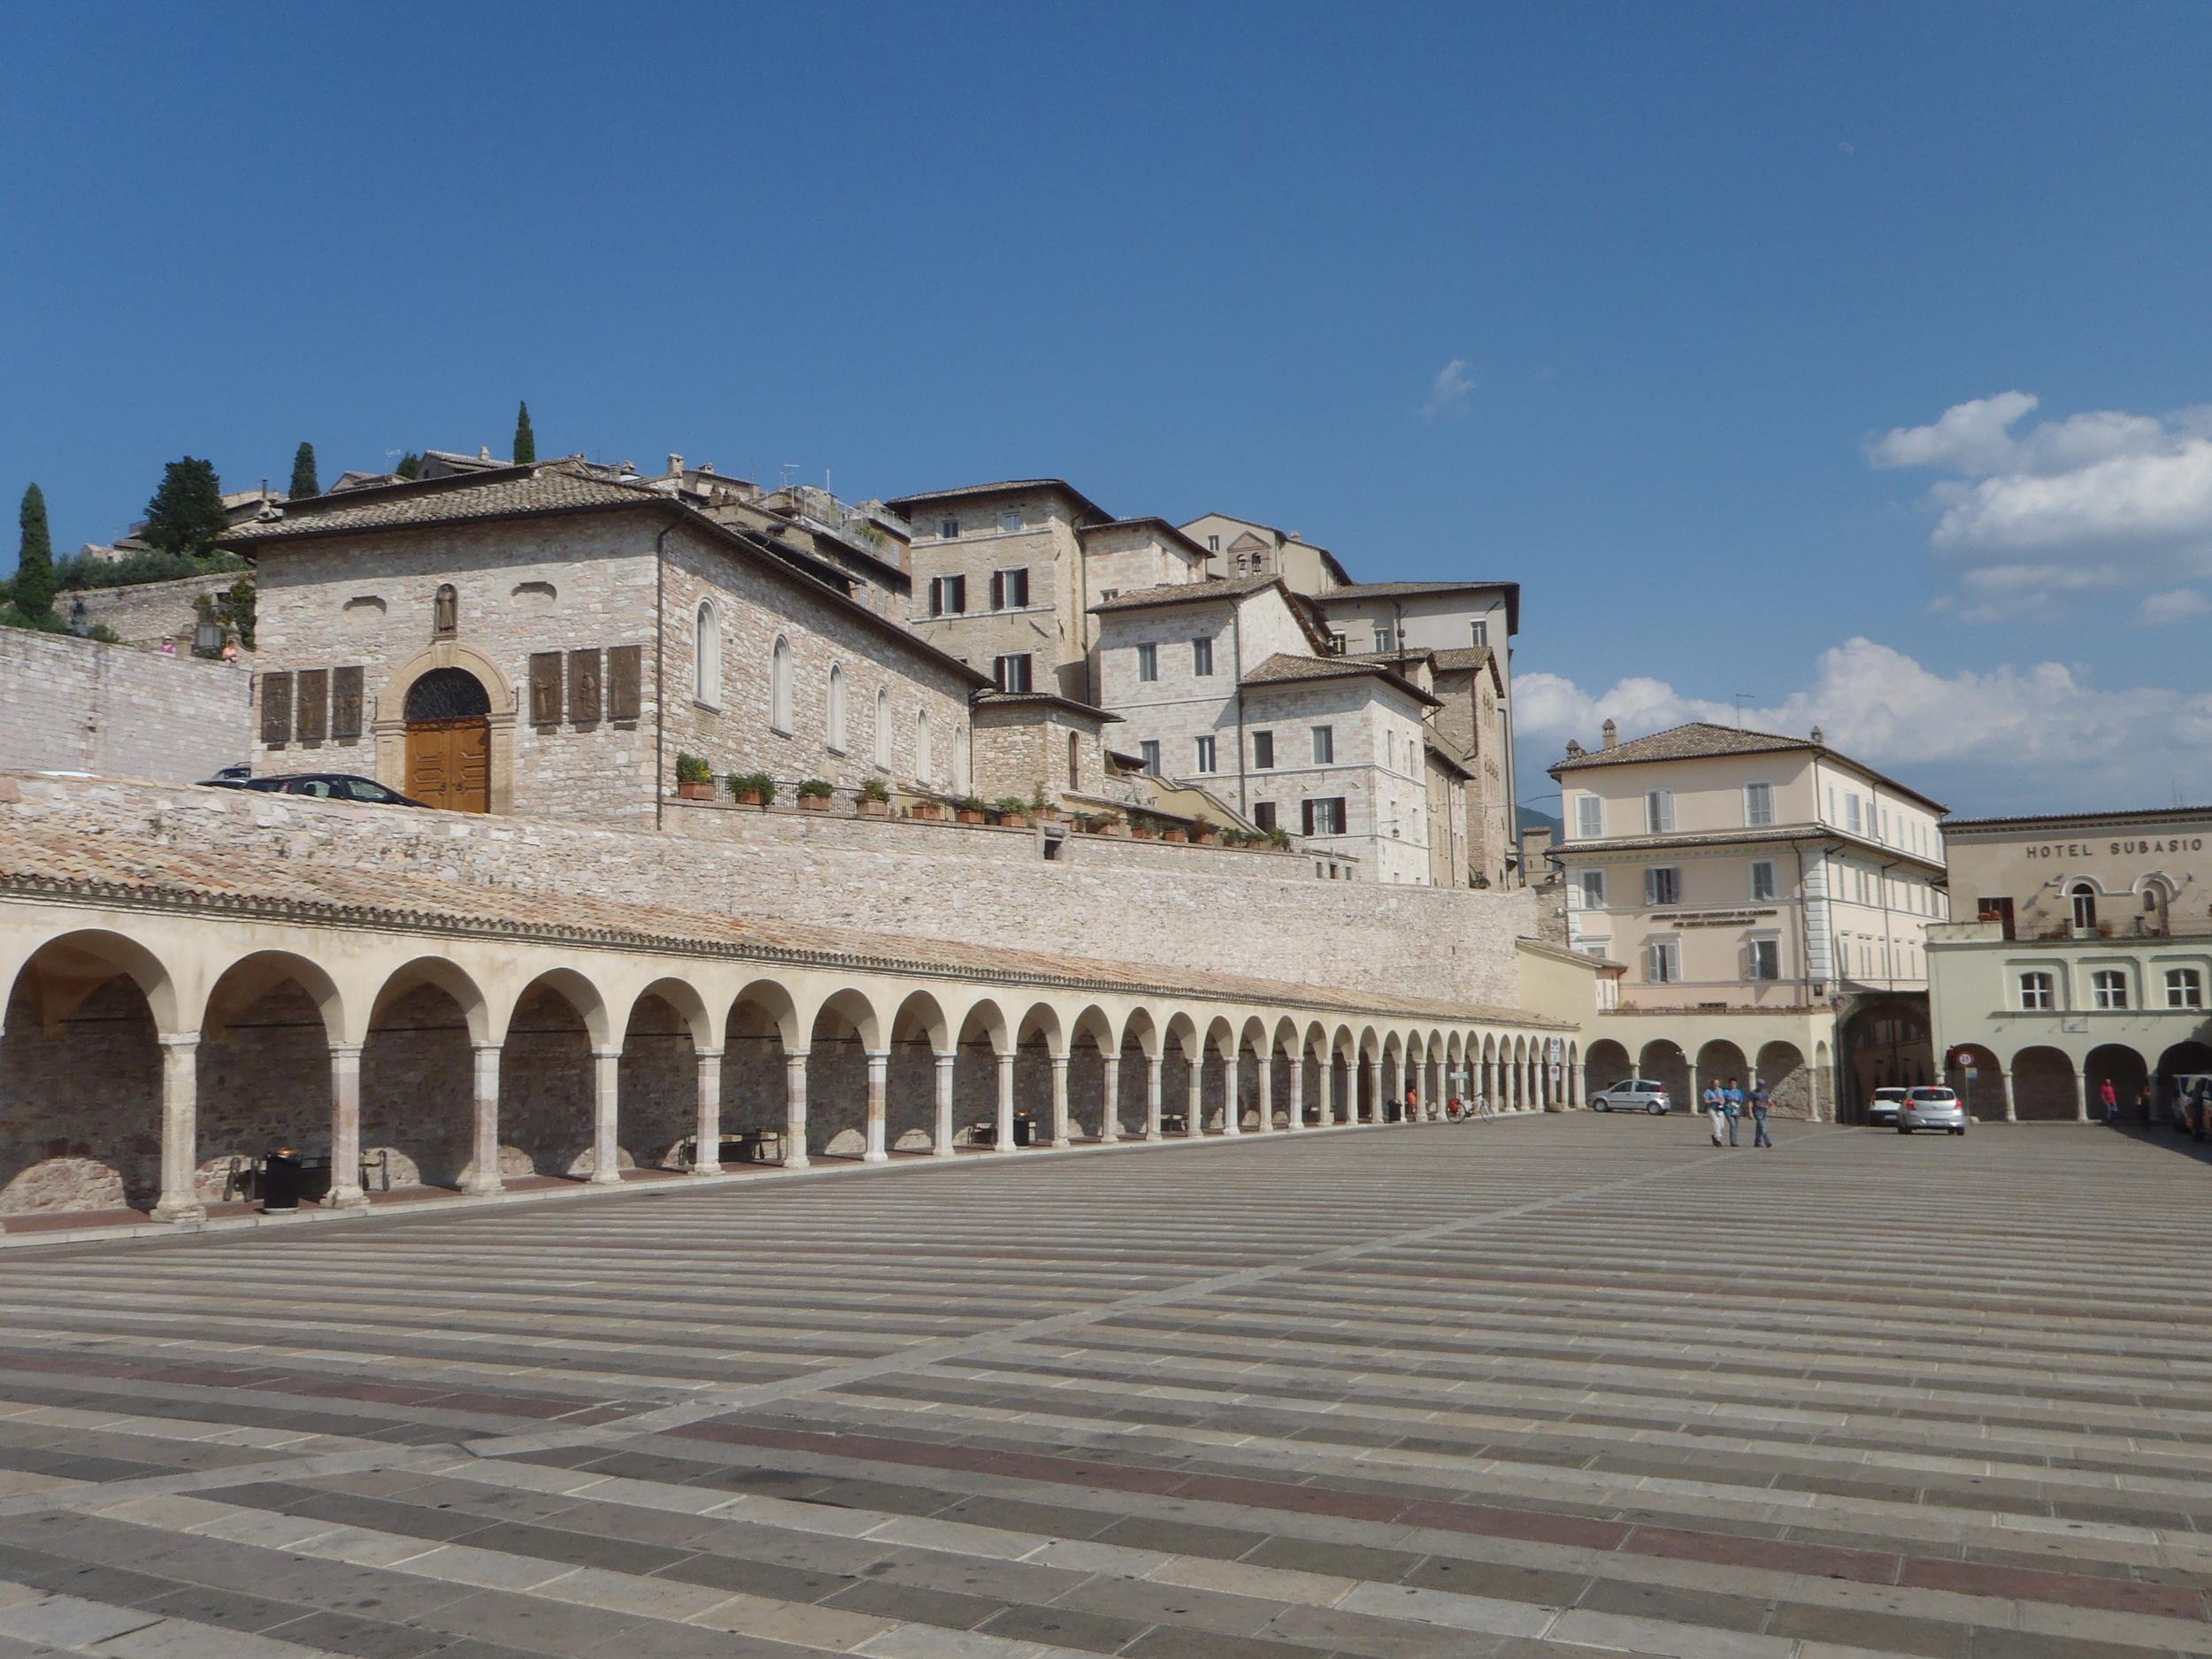 CRO Italy web 2013 - 022.JPG